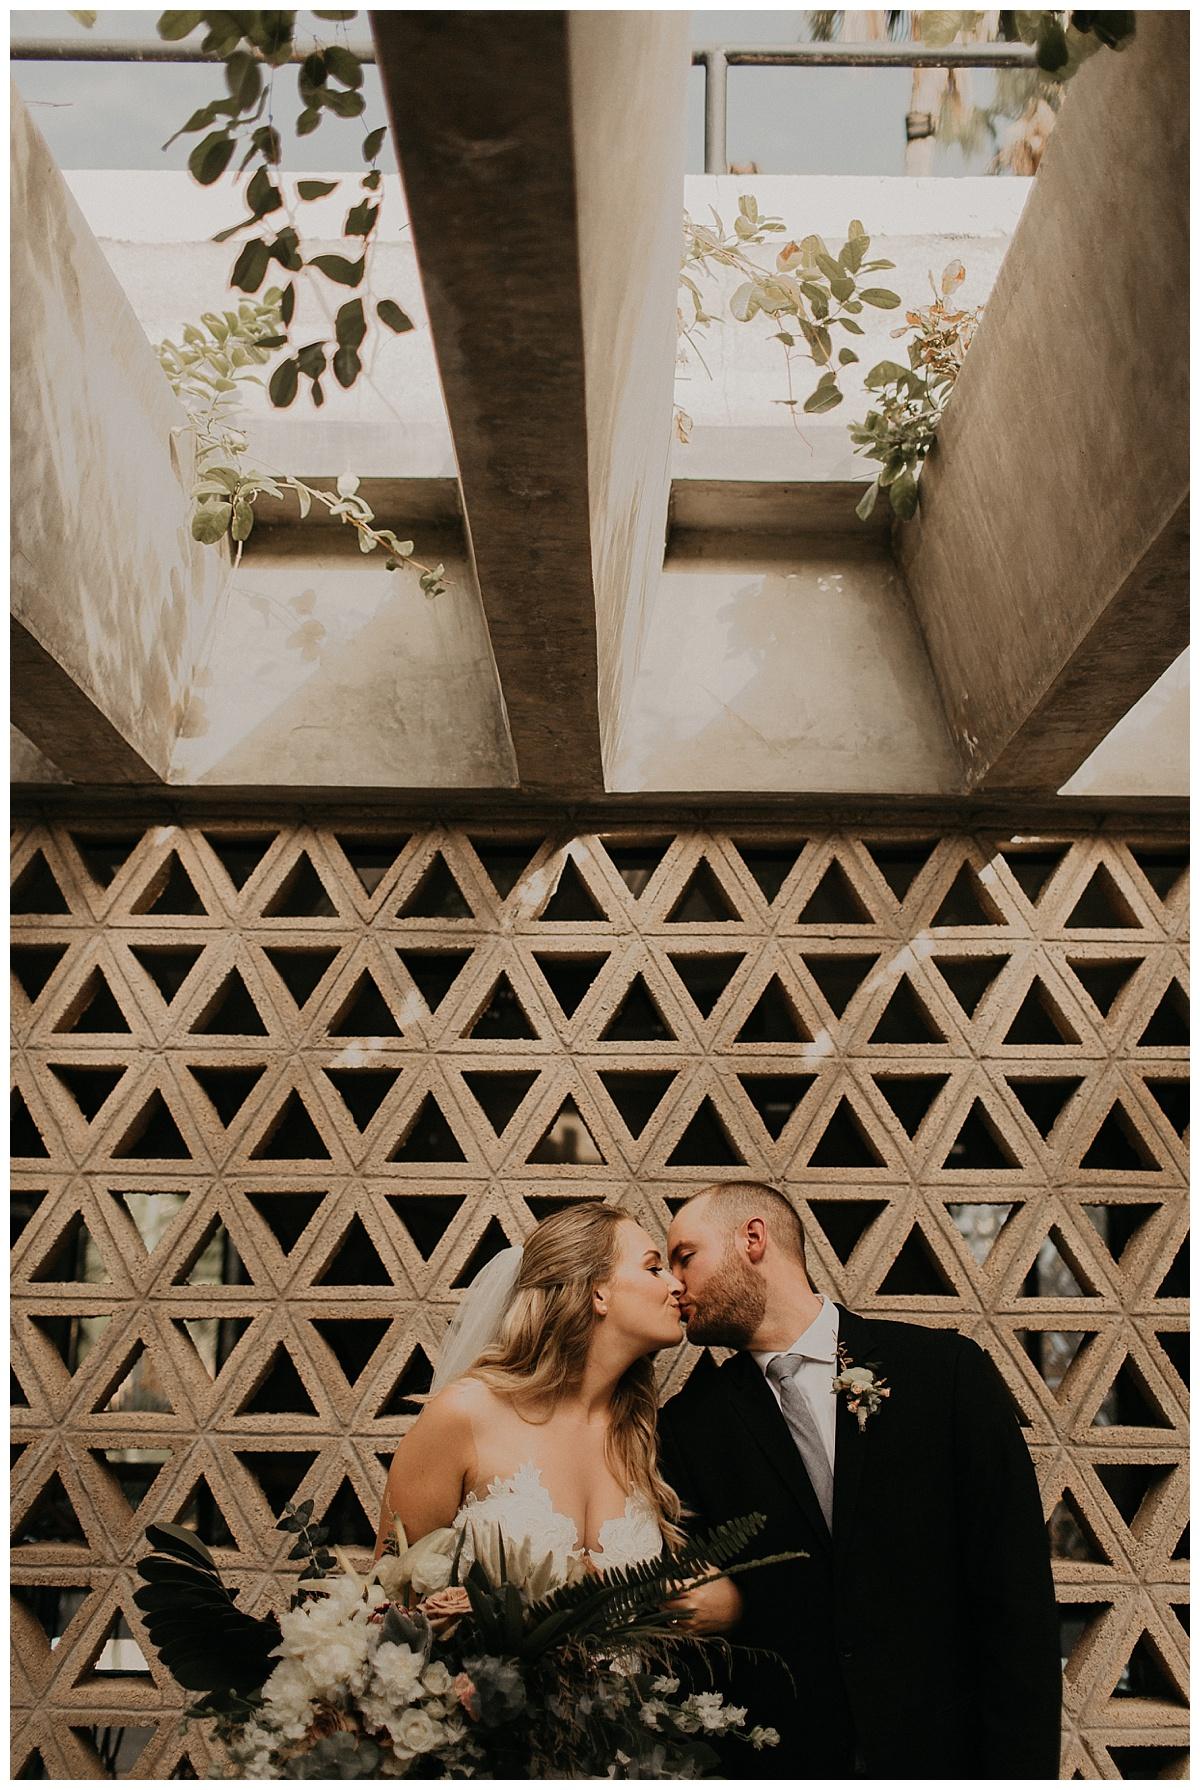 Bixby+Pine-PNW-Wedding-Planners-And-Designers_1614.jpg